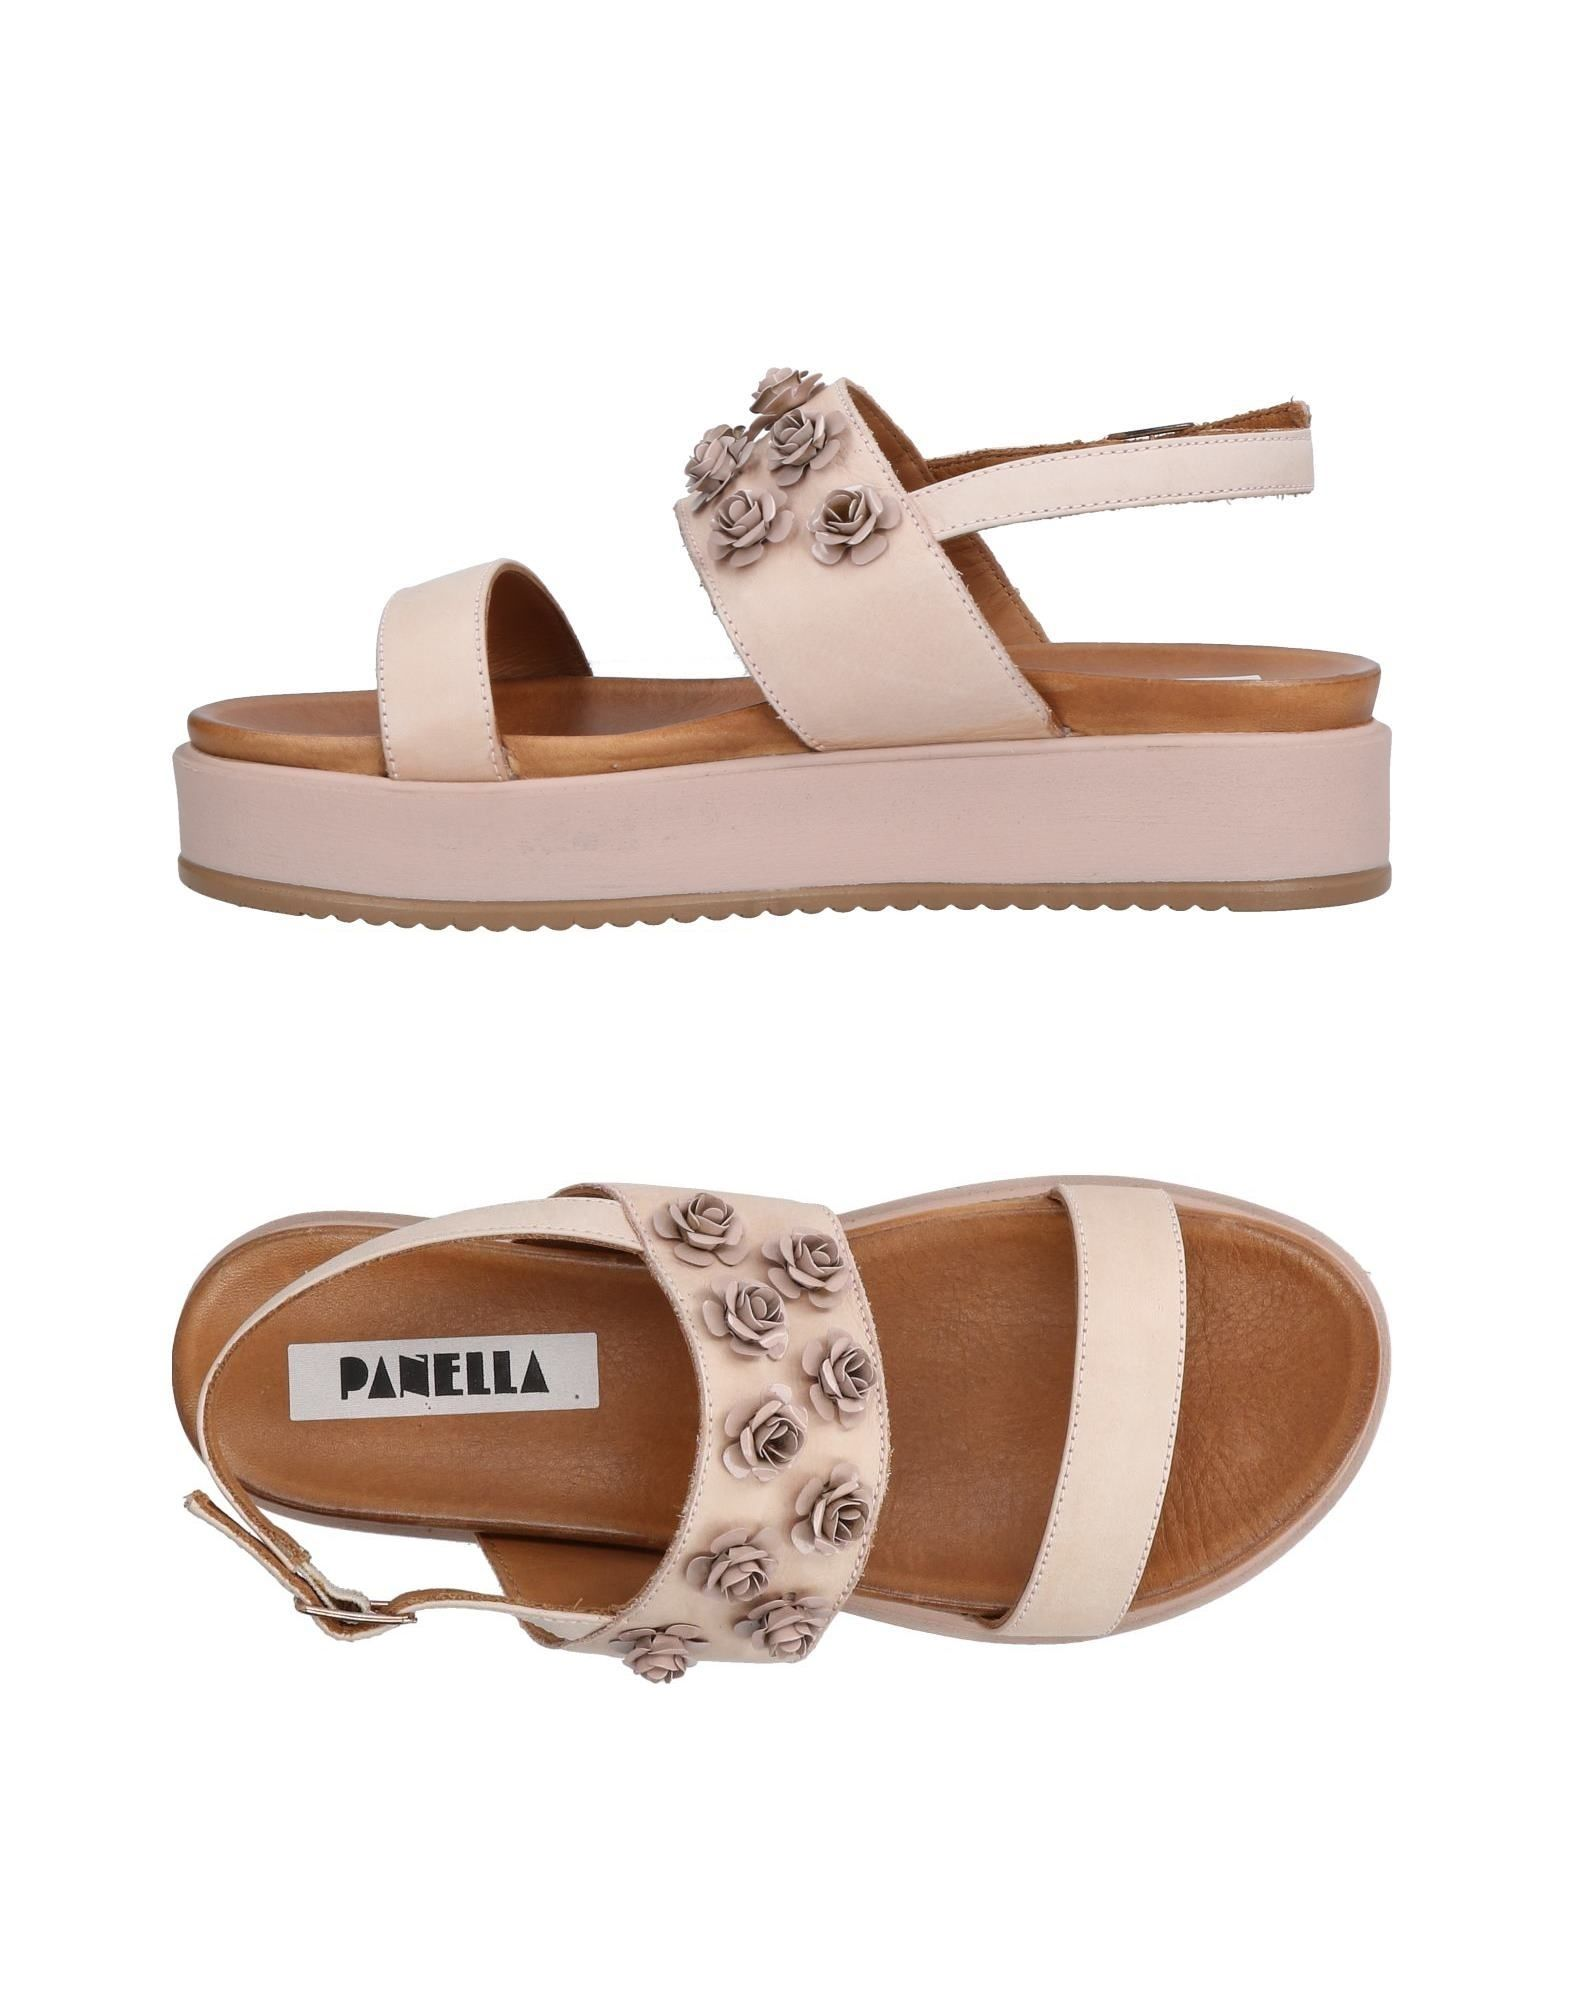 11474152QN Panella Sandalen Damen  11474152QN  Heiße Schuhe 20f6b6